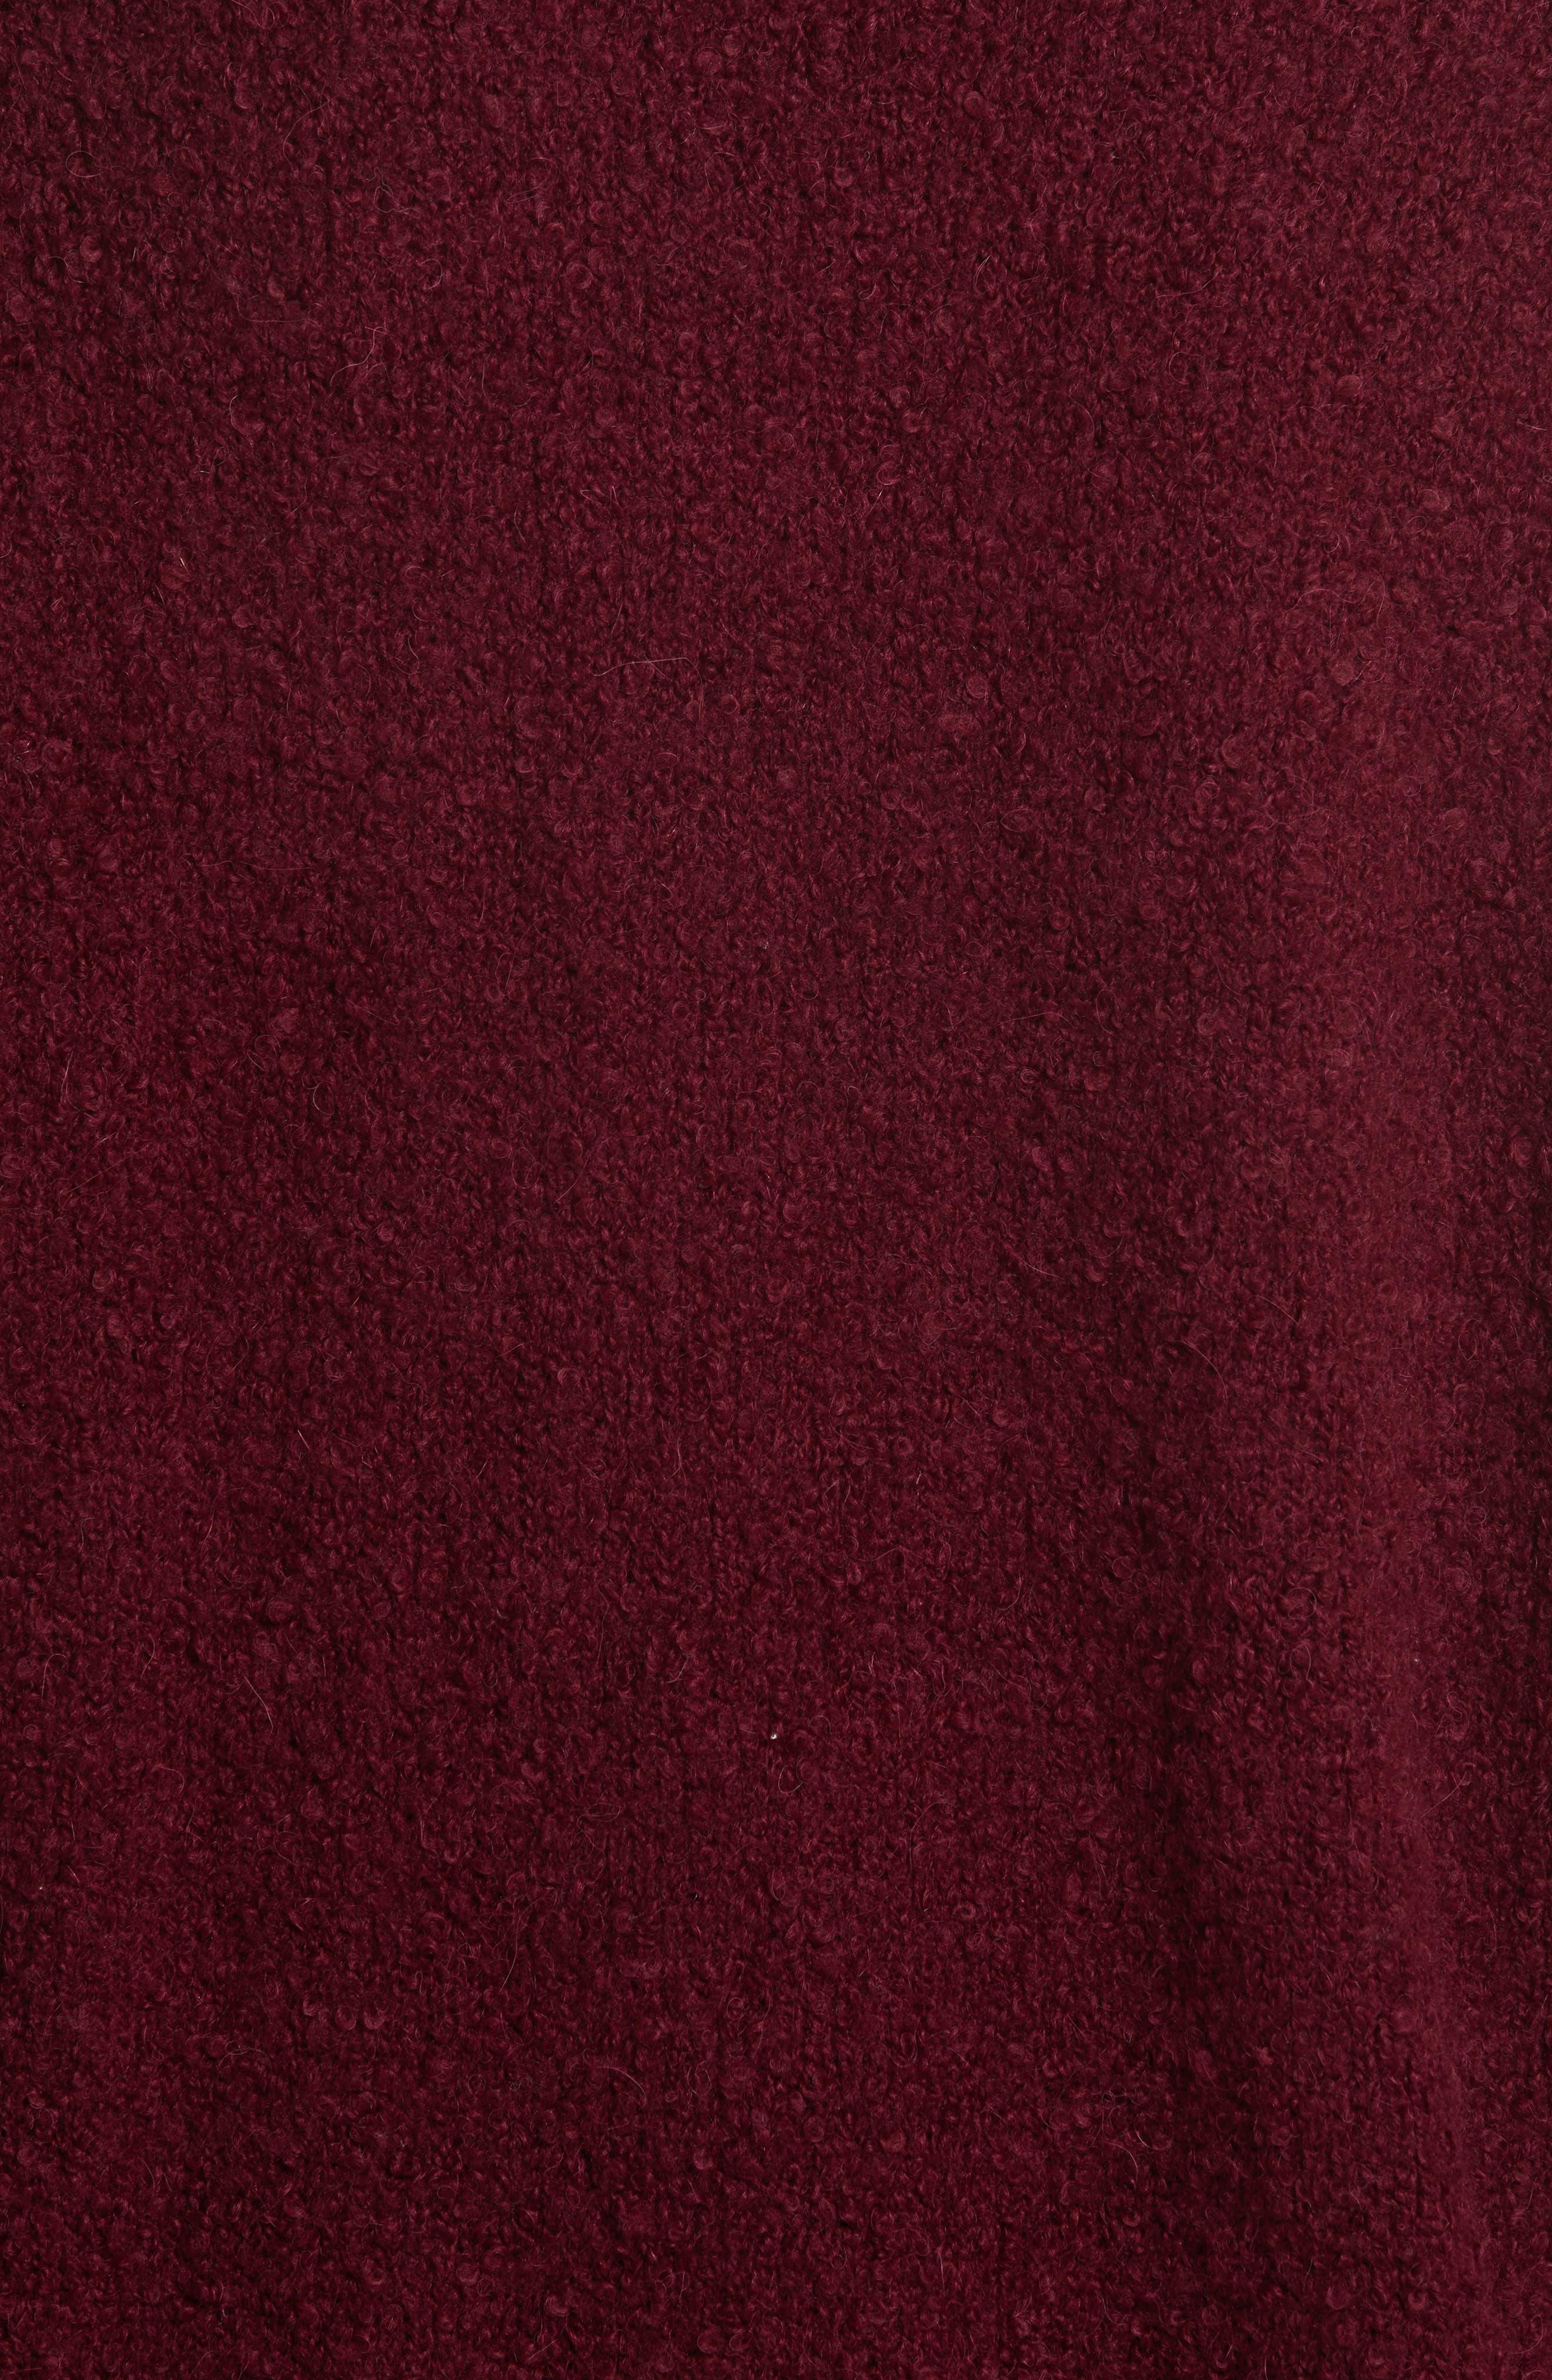 Lofty V-Neck Sweater,                             Alternate thumbnail 35, color,